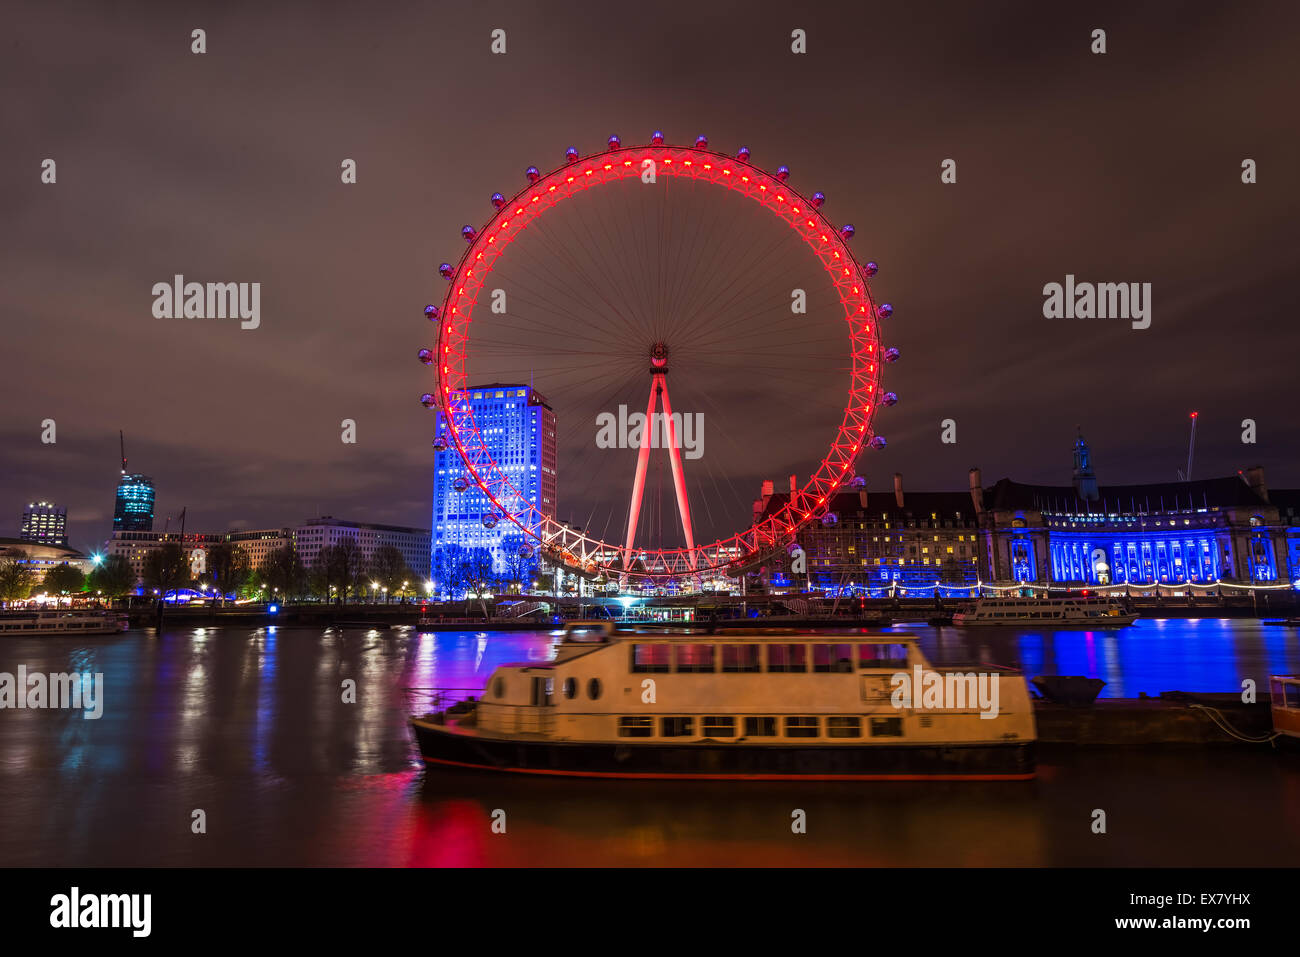 London Eye at night Stock Photo